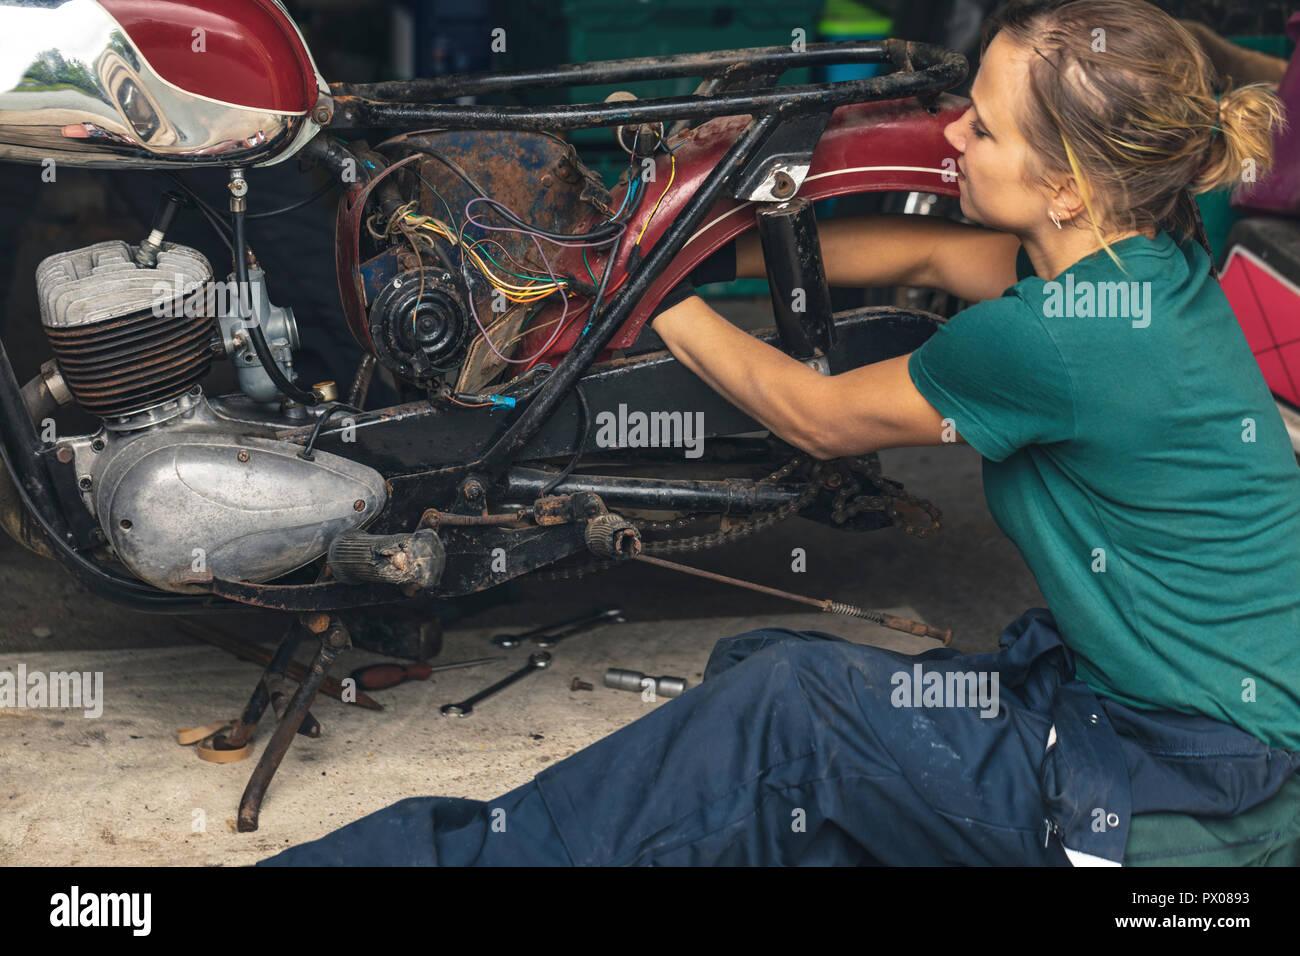 Mechanikerin Reparatur Motorrad in einer Garage. Stockfoto